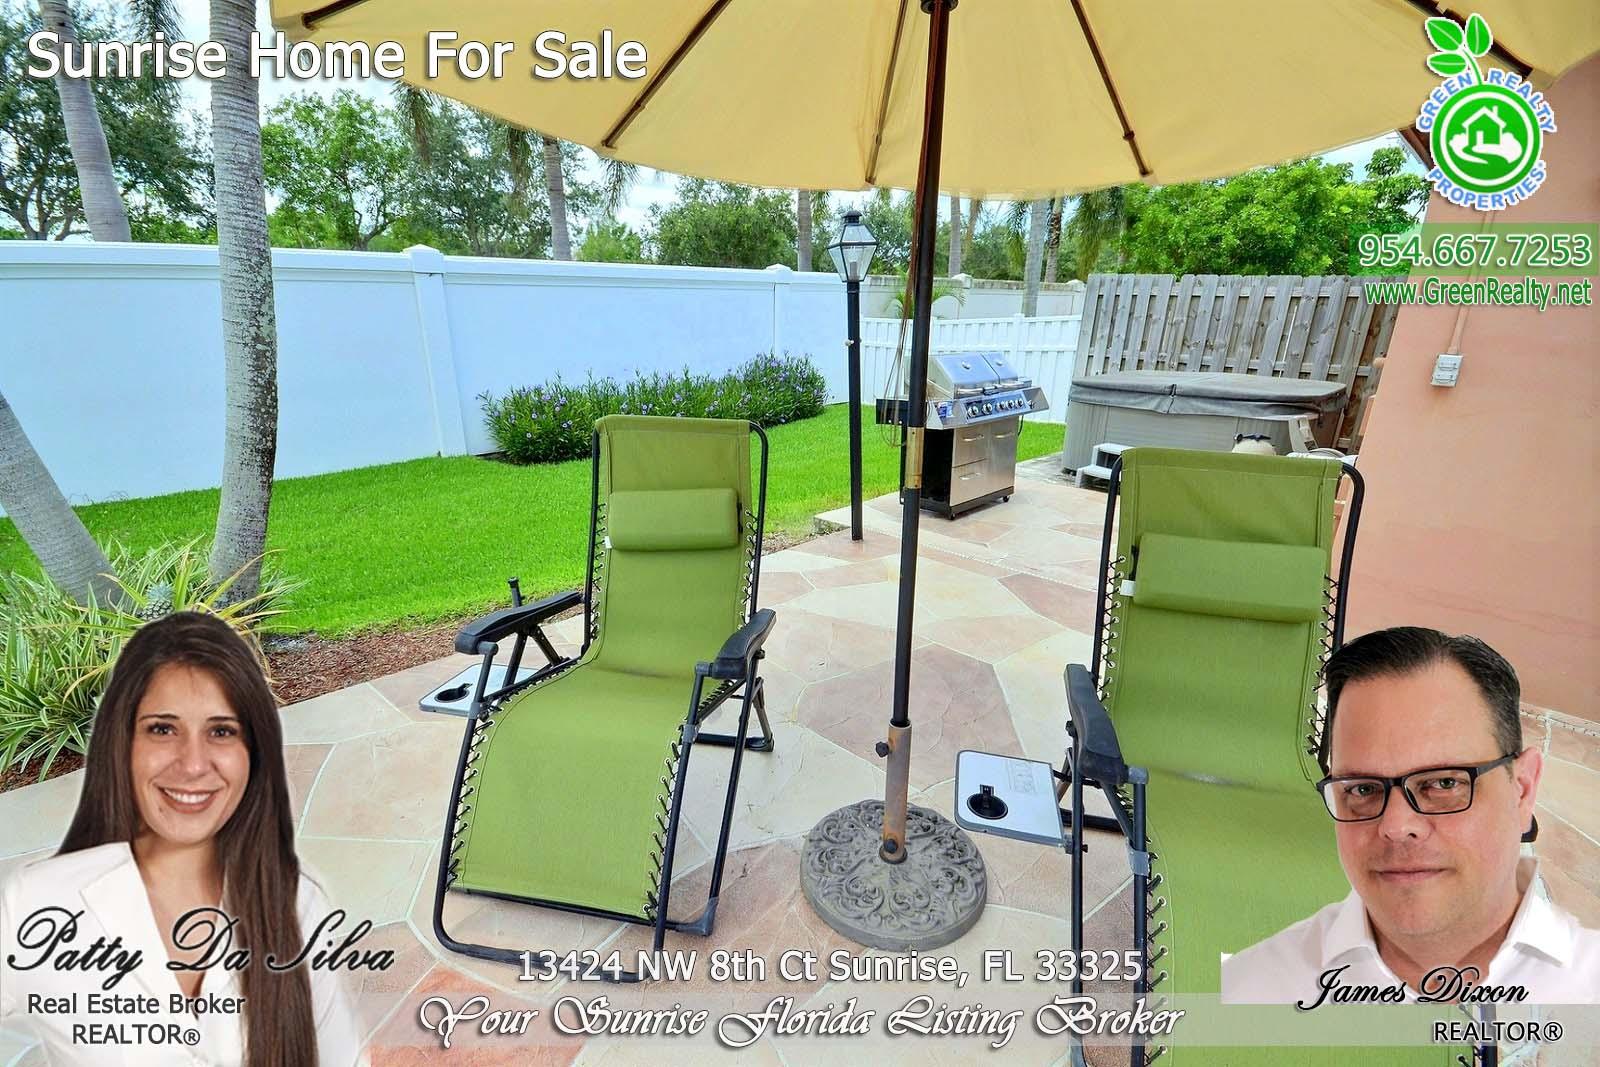 27 Sunrise Florida Pool Homes For Sale (2)